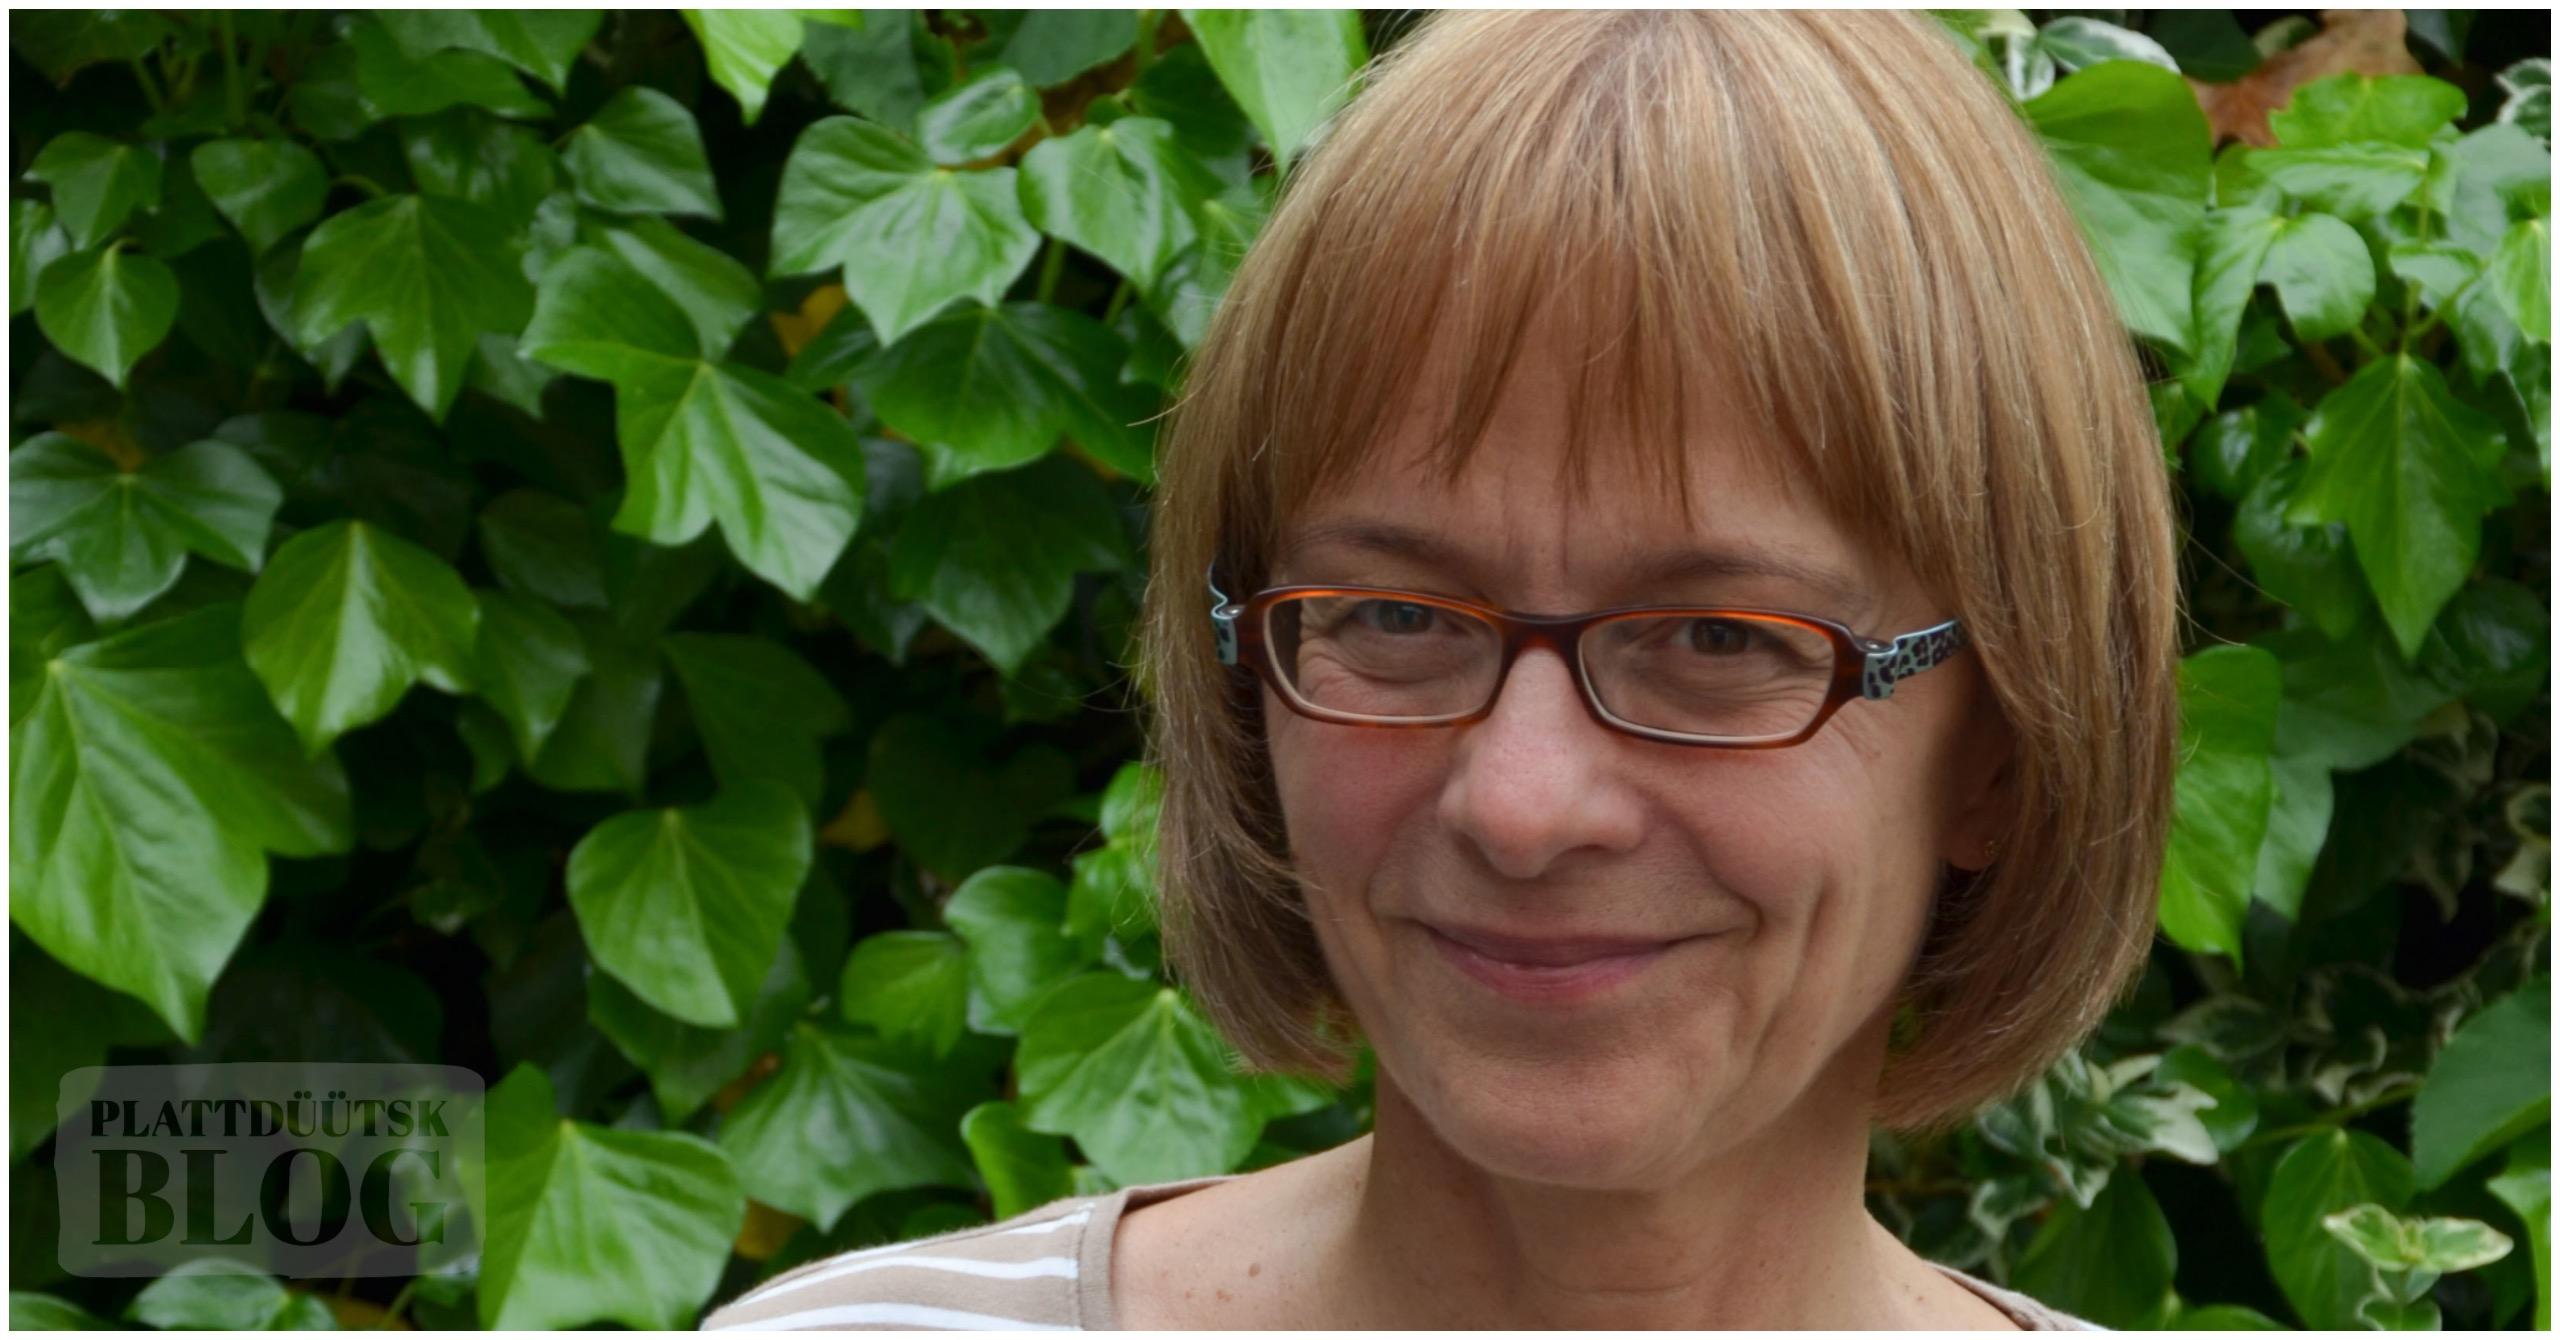 Cornelia Nath - PlattdüütskBlog